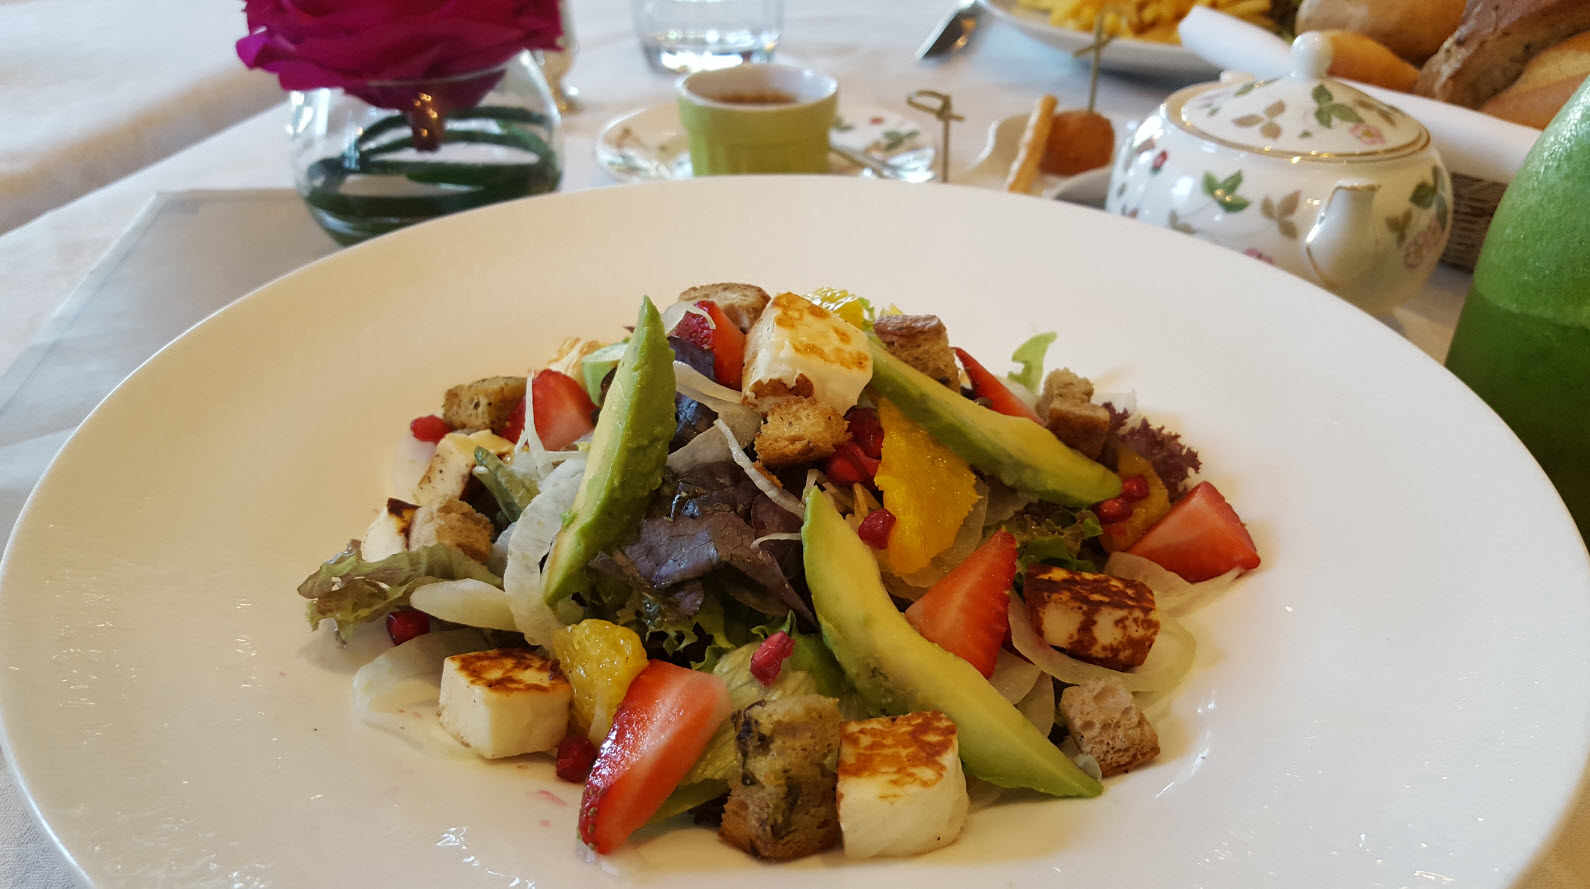 Salade halloumi et fraises